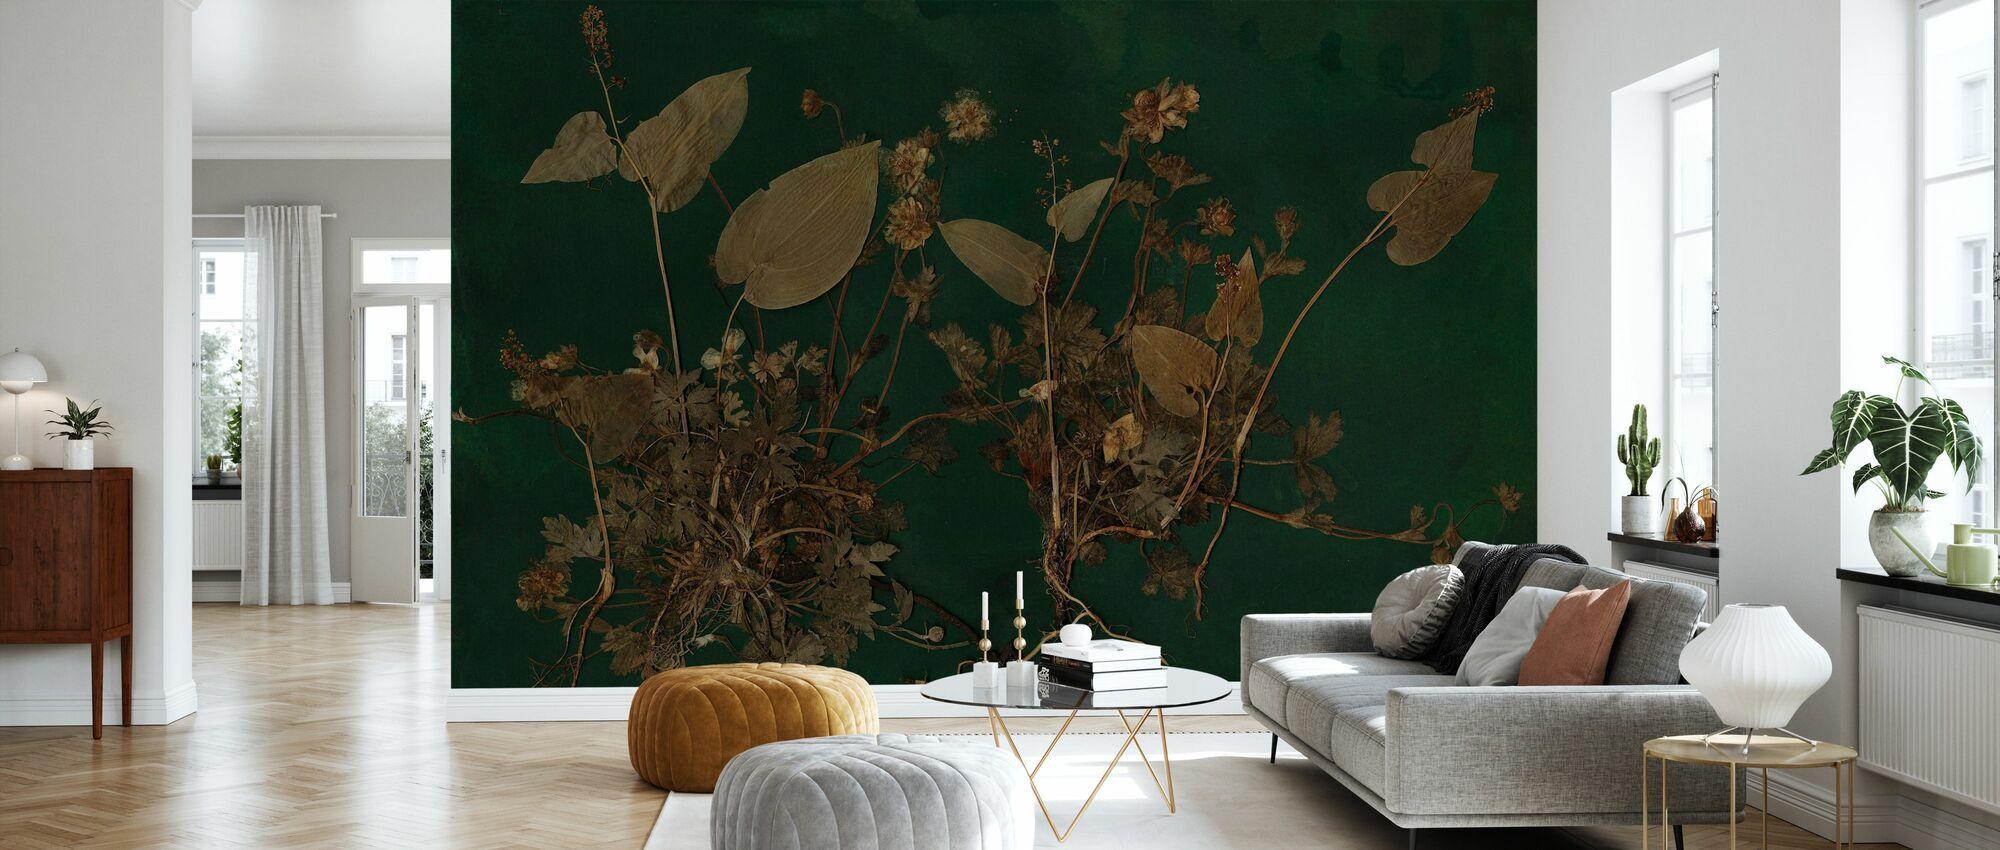 Plantasia - Wallpaper - Living Room